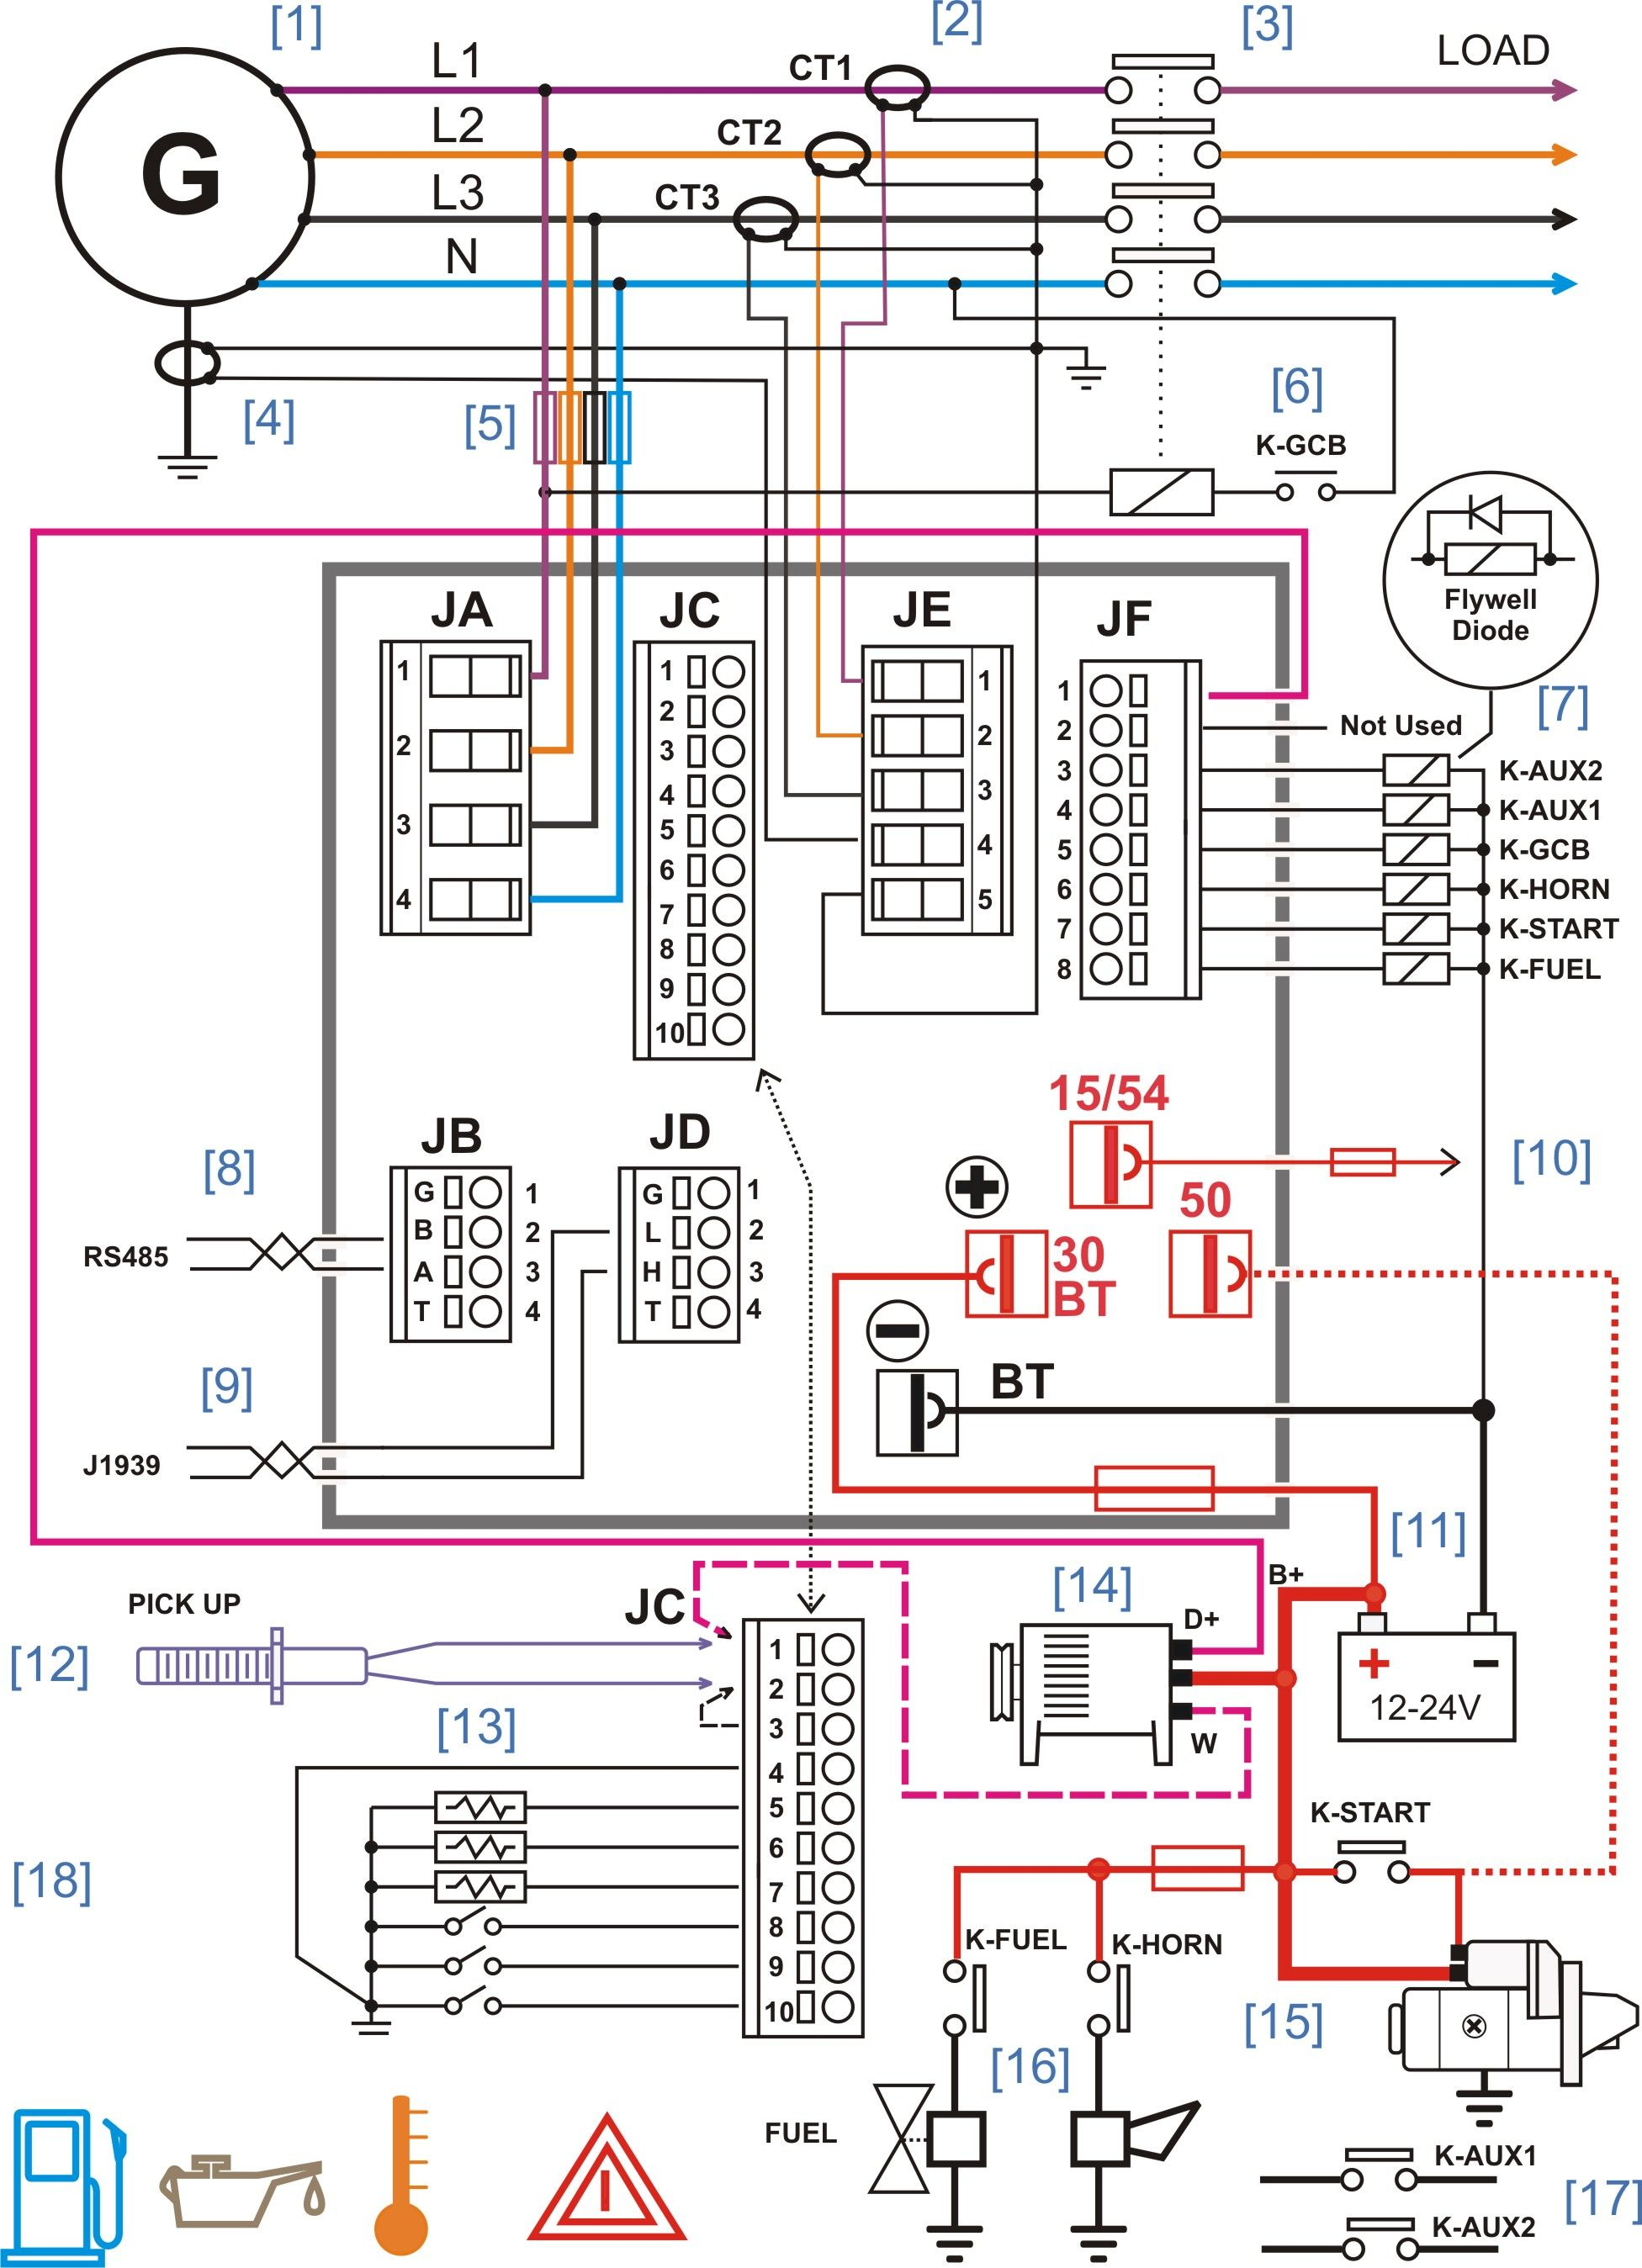 Standby Generator Wiring Diagram - Diesel Generator Control Panel Wiring Diagram 10c